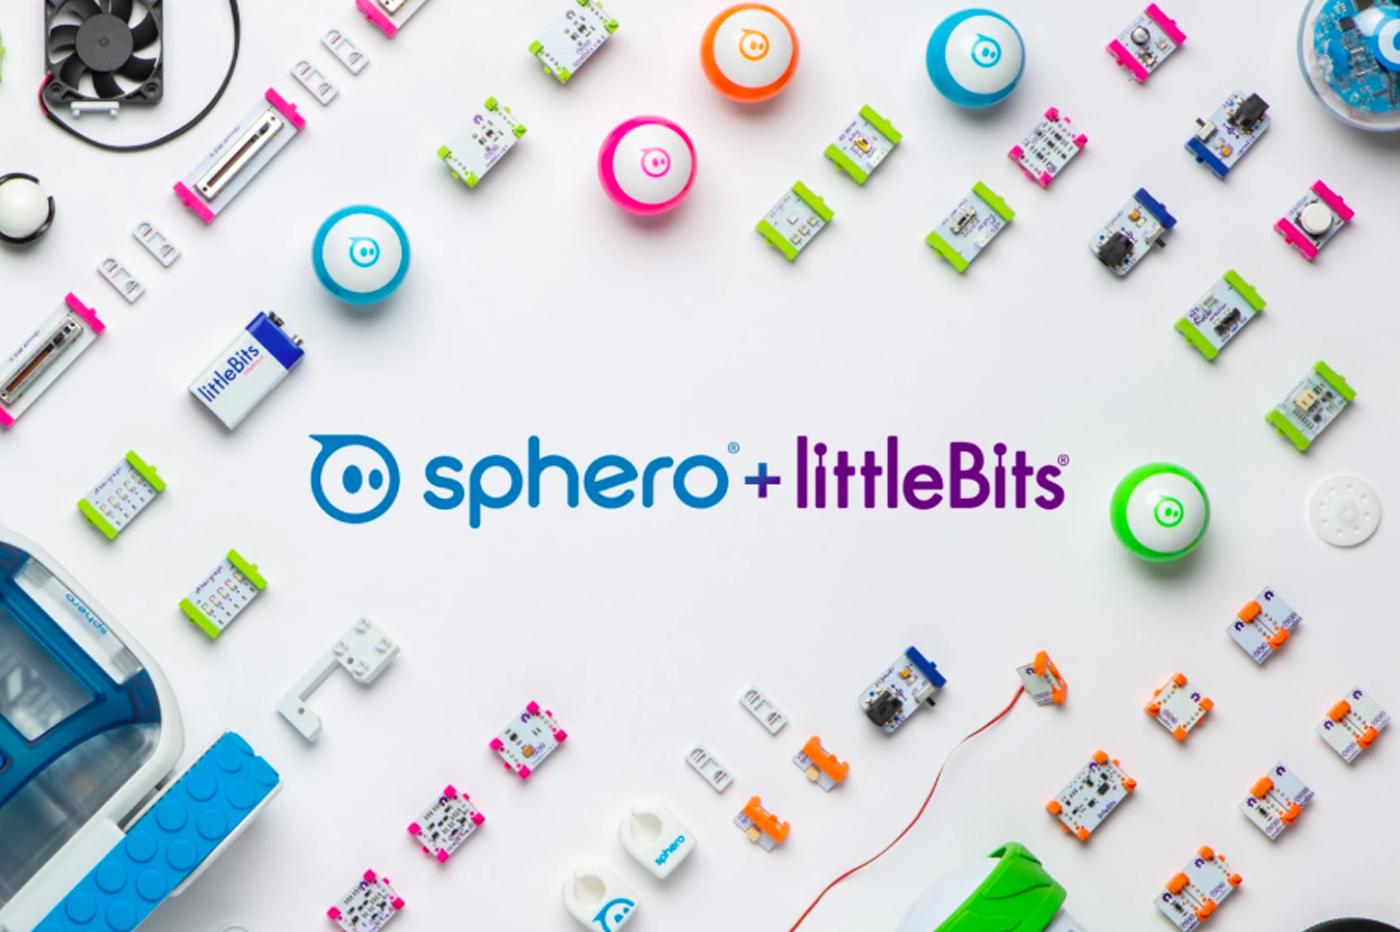 L'empire de Sphero s'agrandit en accueillant Littlebits